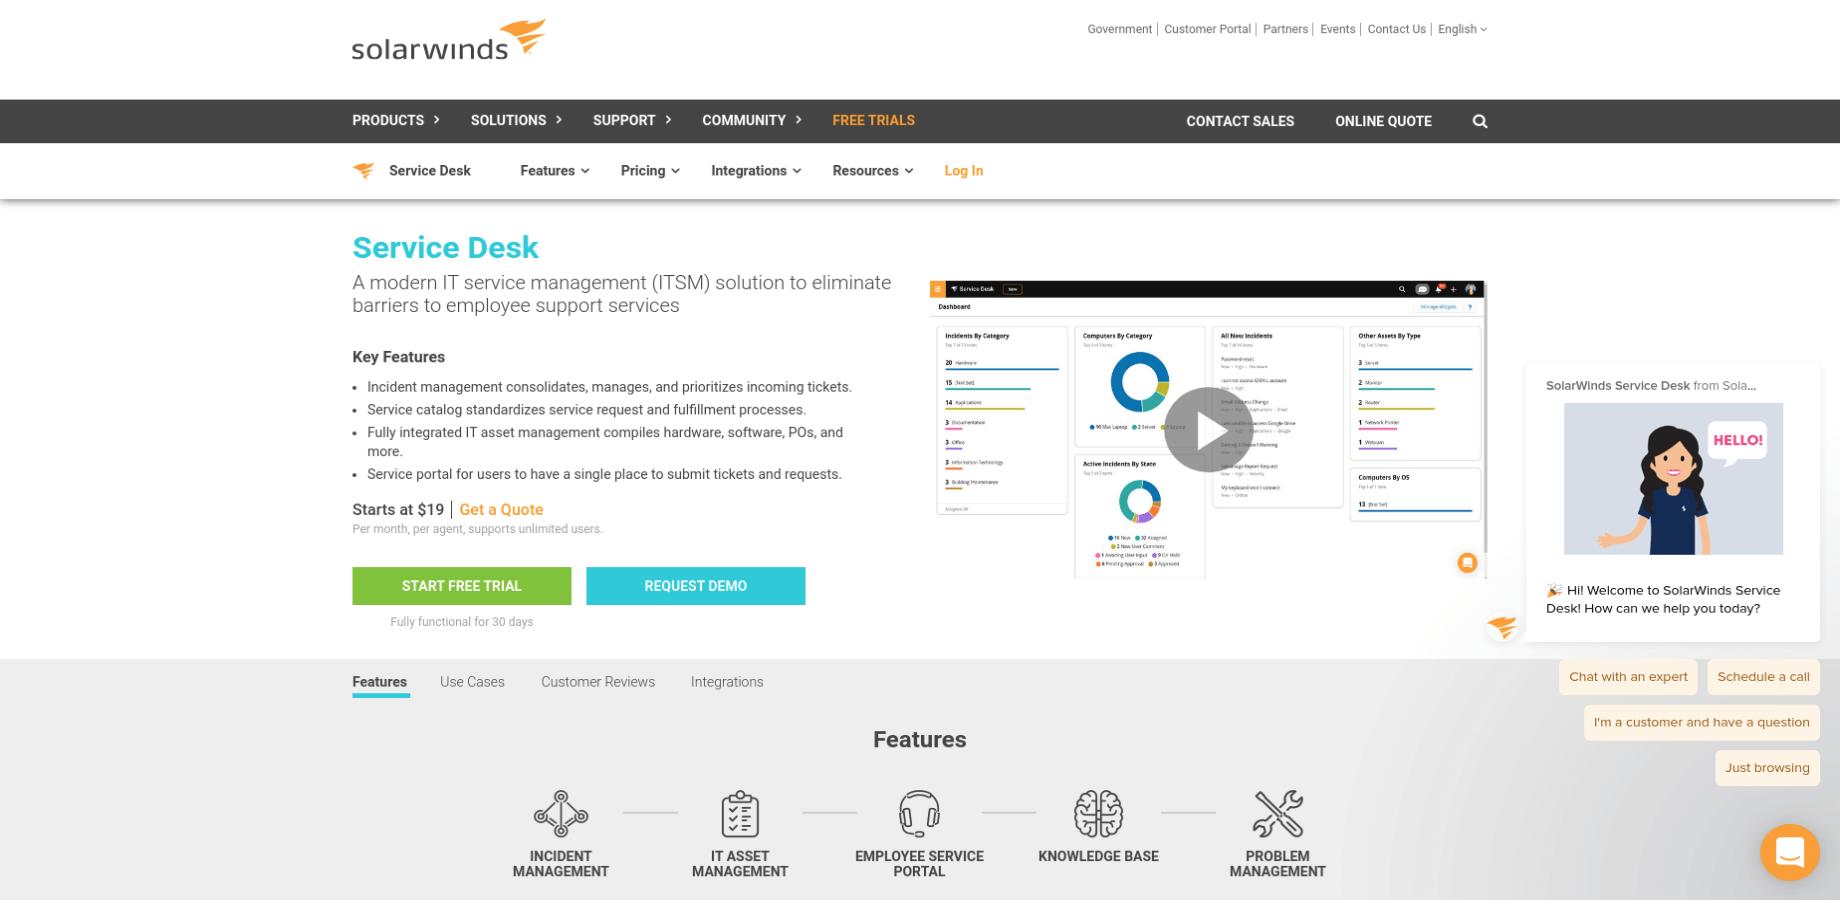 SolarWinds Service Desk Landing Page Screenshot